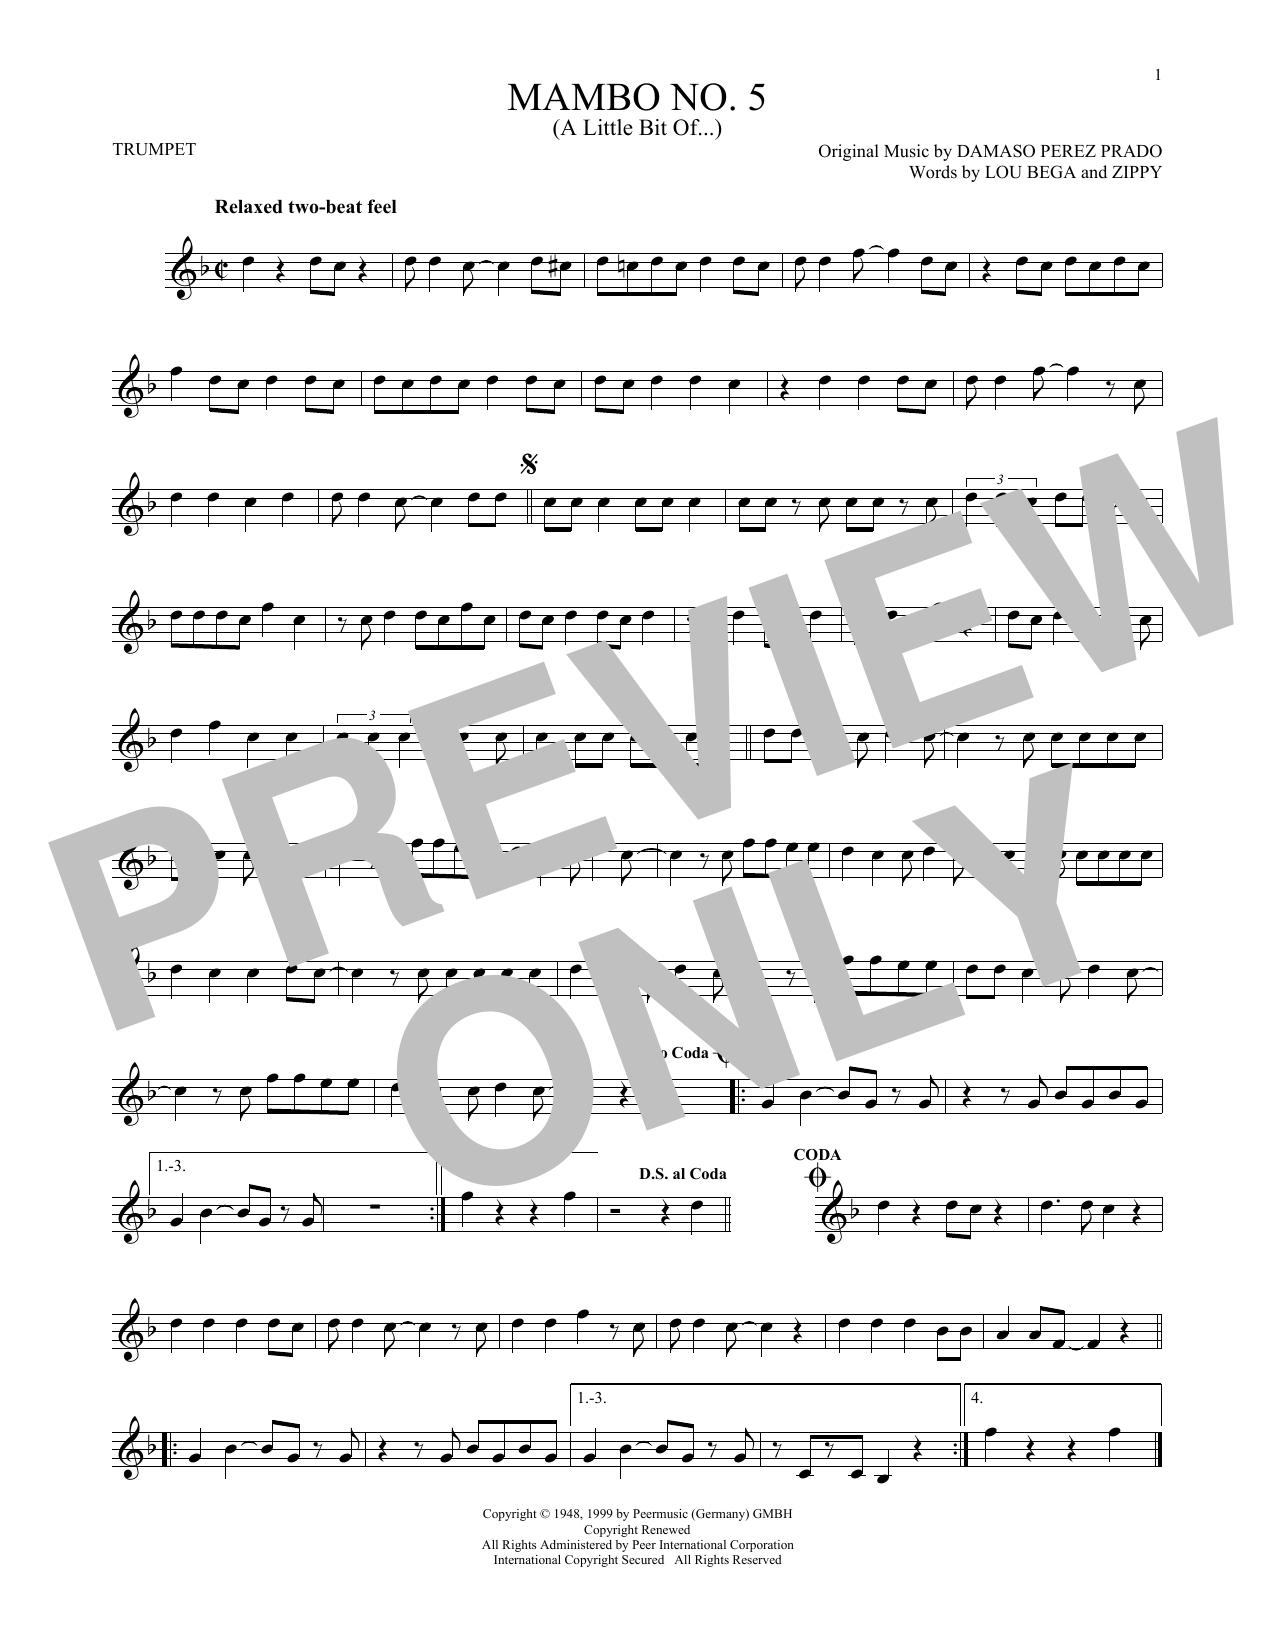 Mambo No. 5 (A Little Bit Of...) (Trumpet Solo)